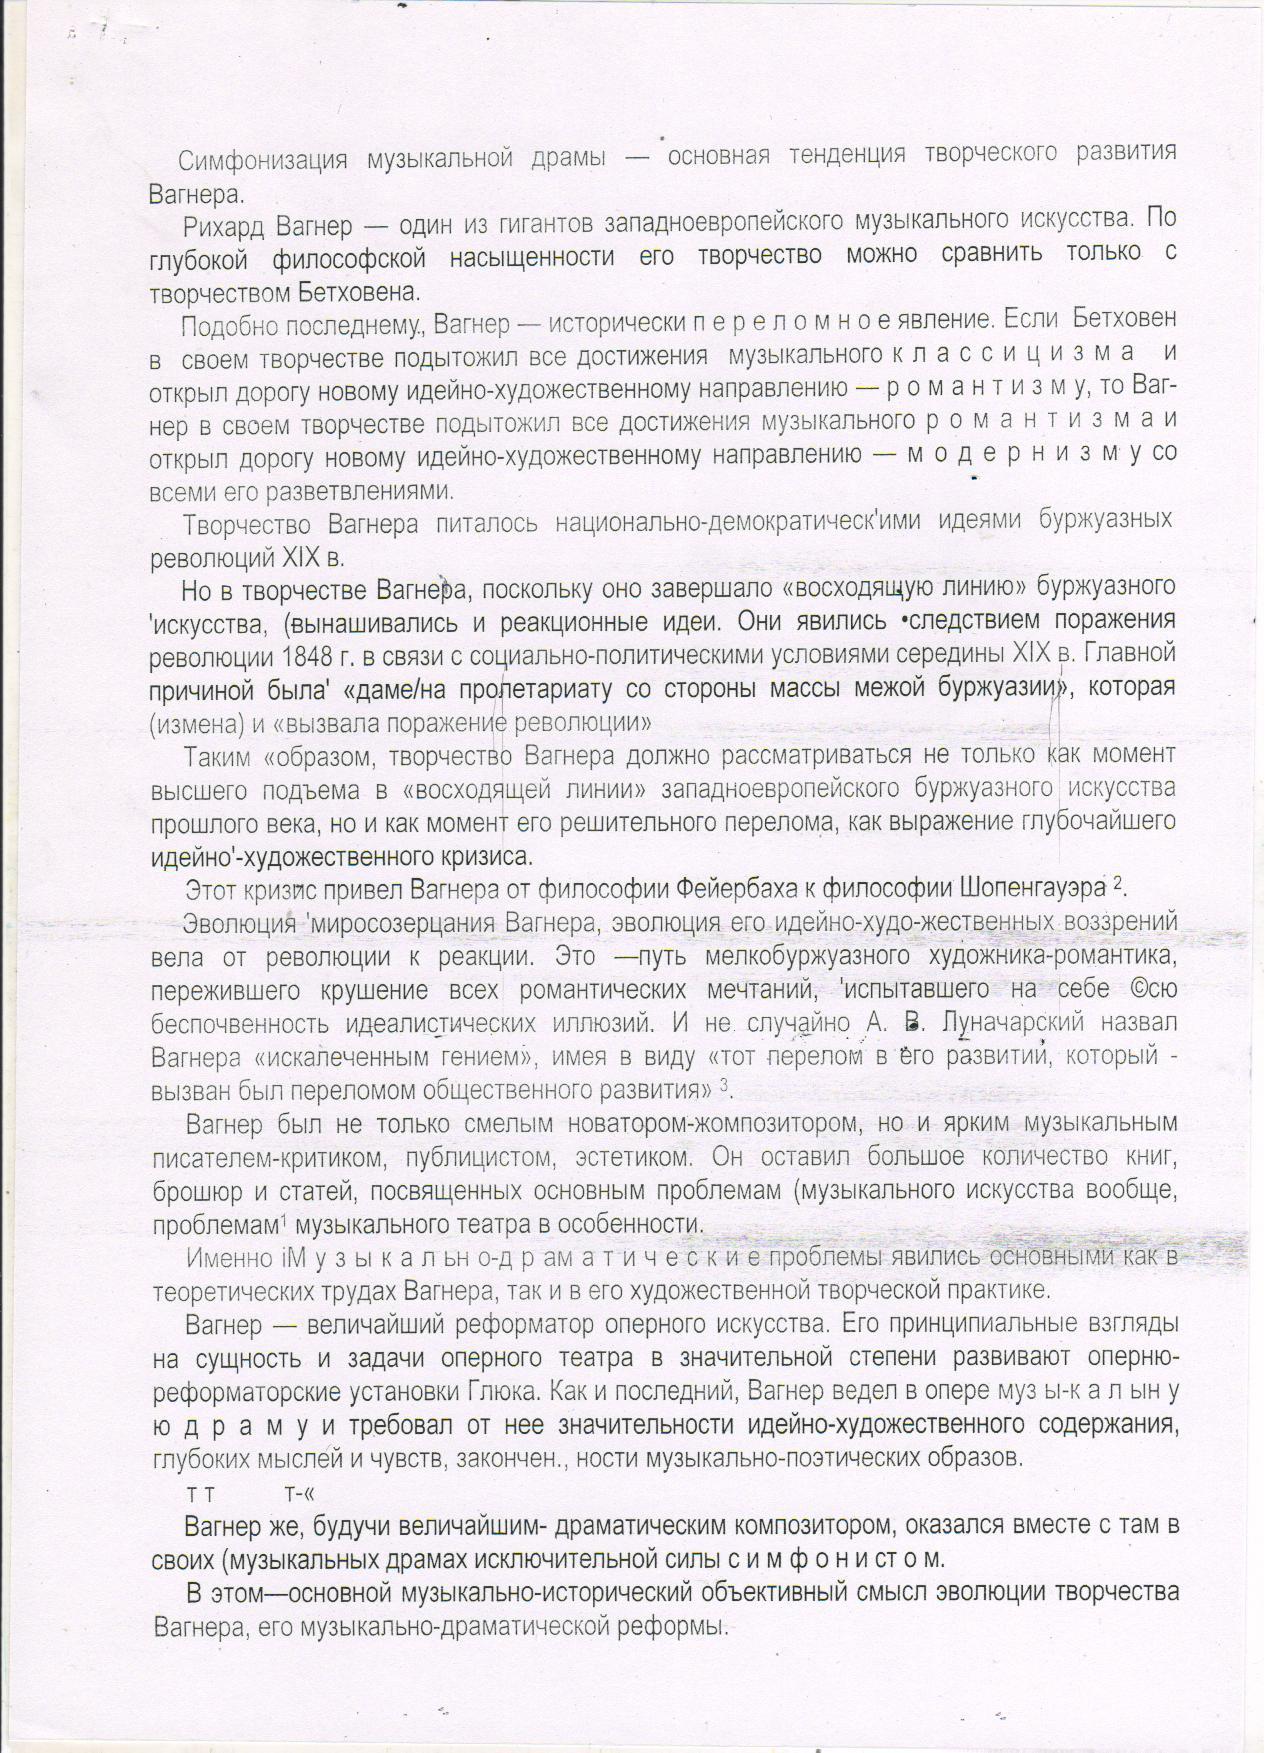 C:\Documents and Settings\Учитель\Рабочий стол\творчество Вагнера 2.jpg